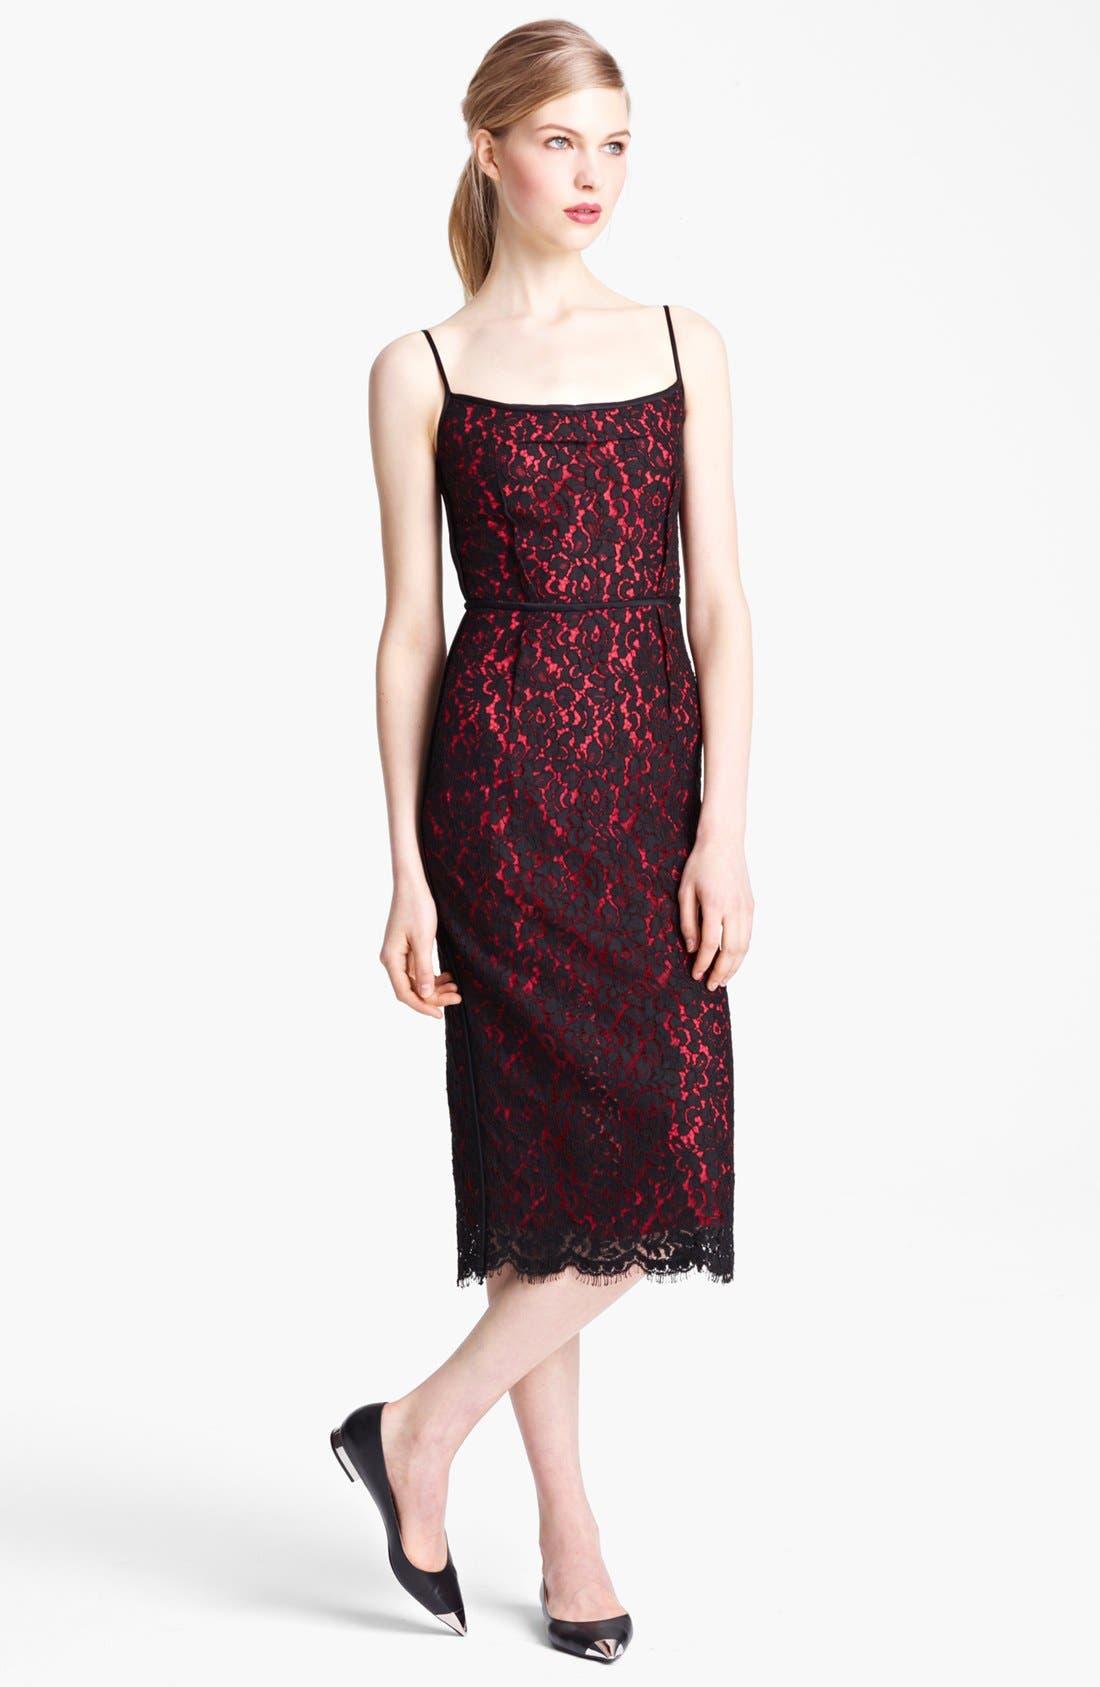 Main Image - Michael Kors Floral Lace Sheath Dress